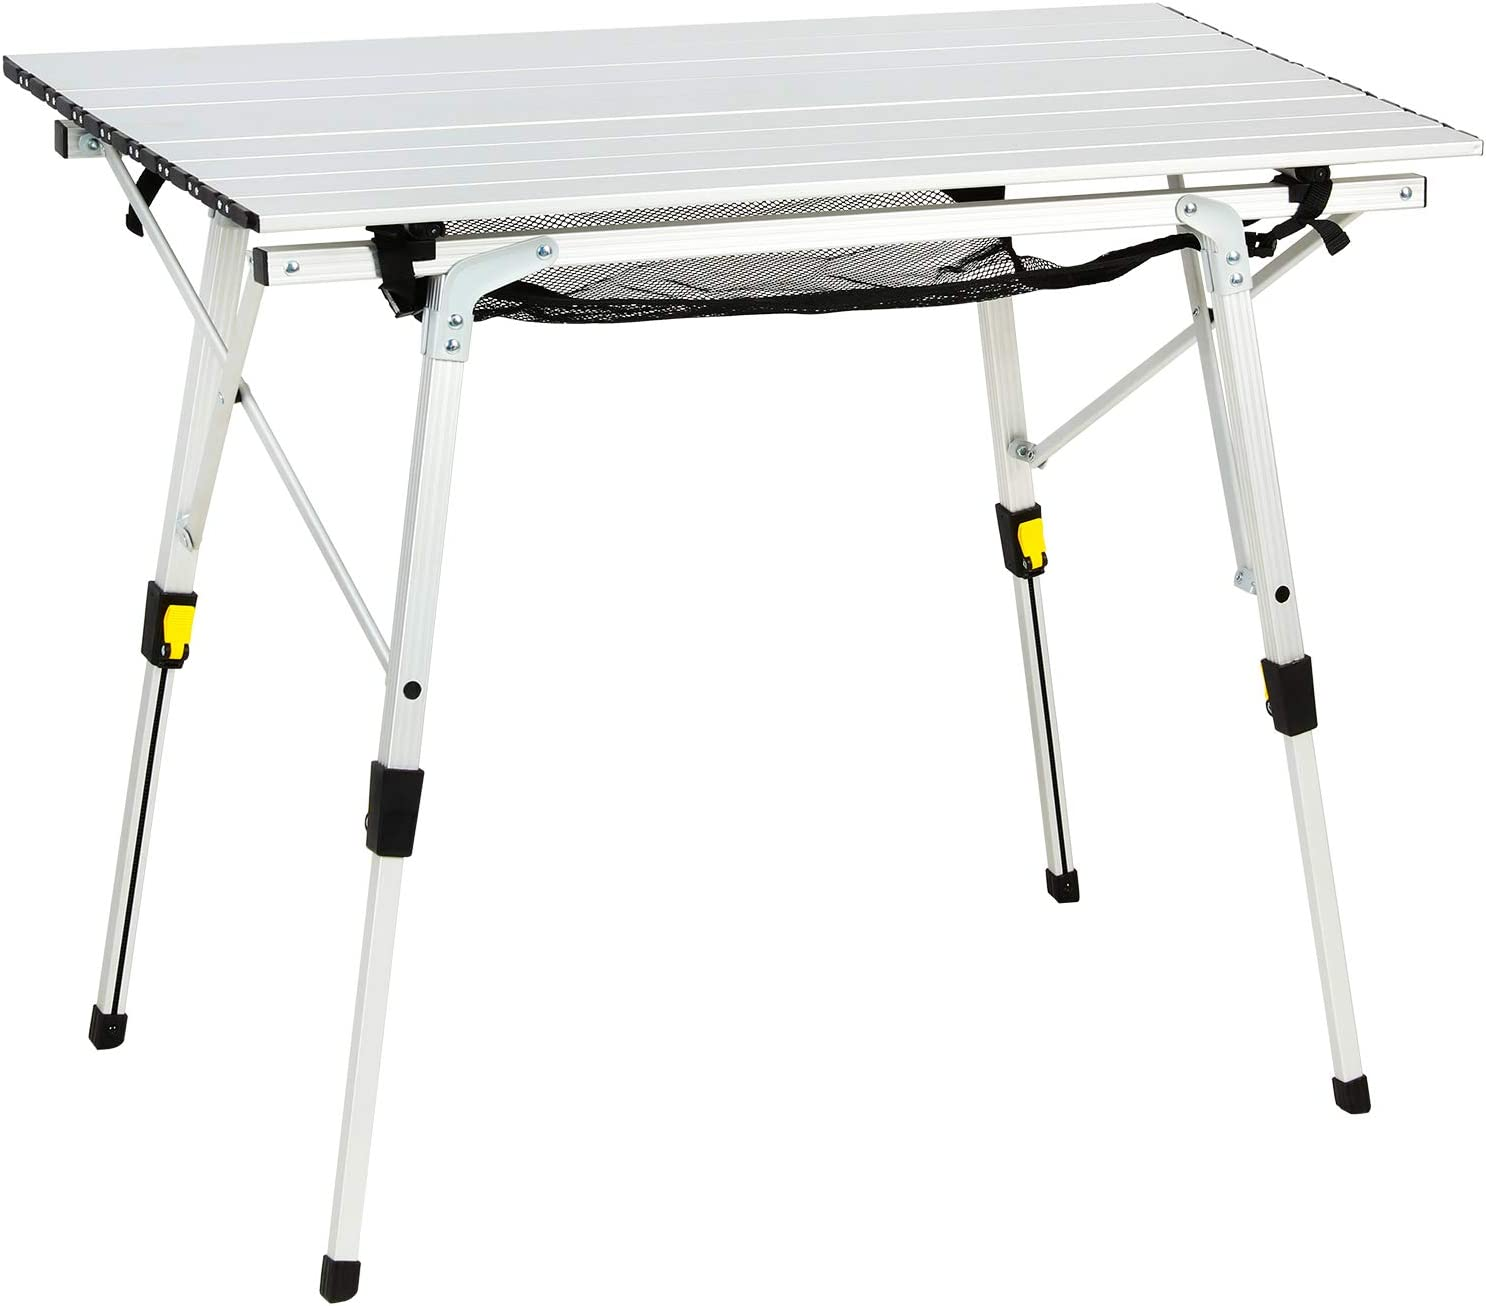 PORTAL Outdoor Folding Portable Picnic Camping Table